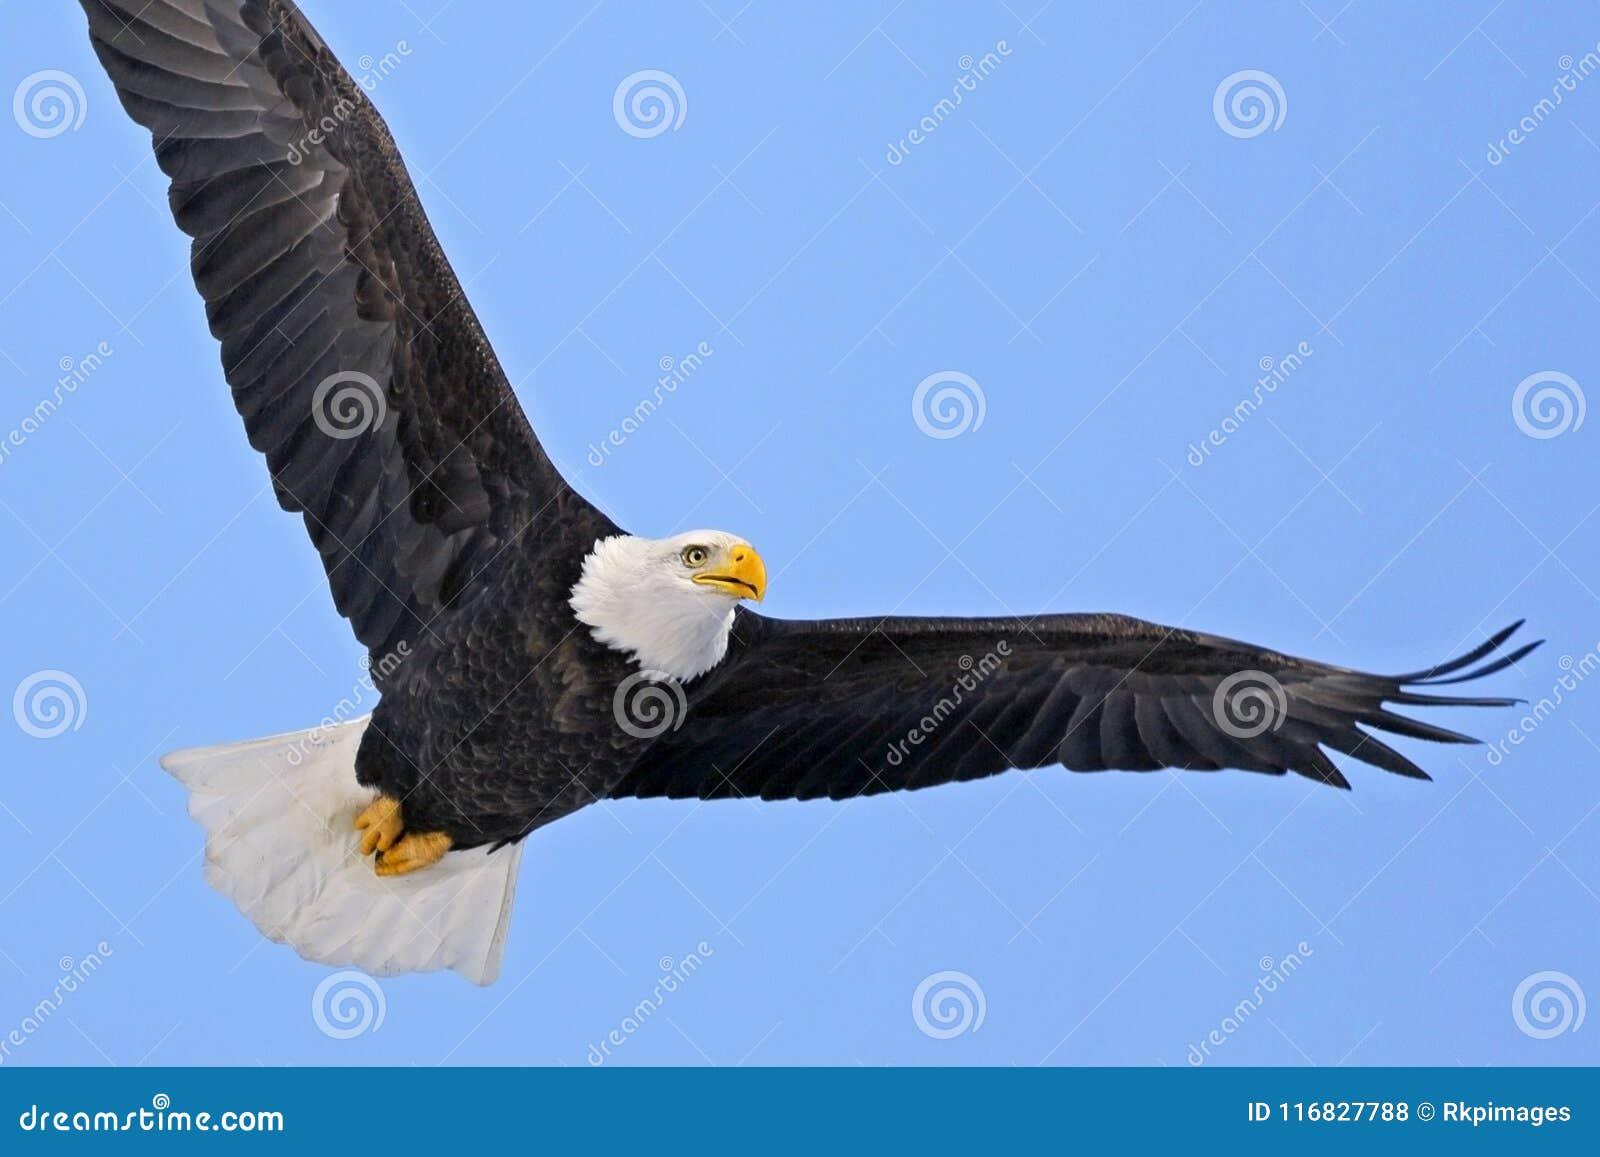 Beautiful American Bald Eagle In Flight Focussed Stock Photo